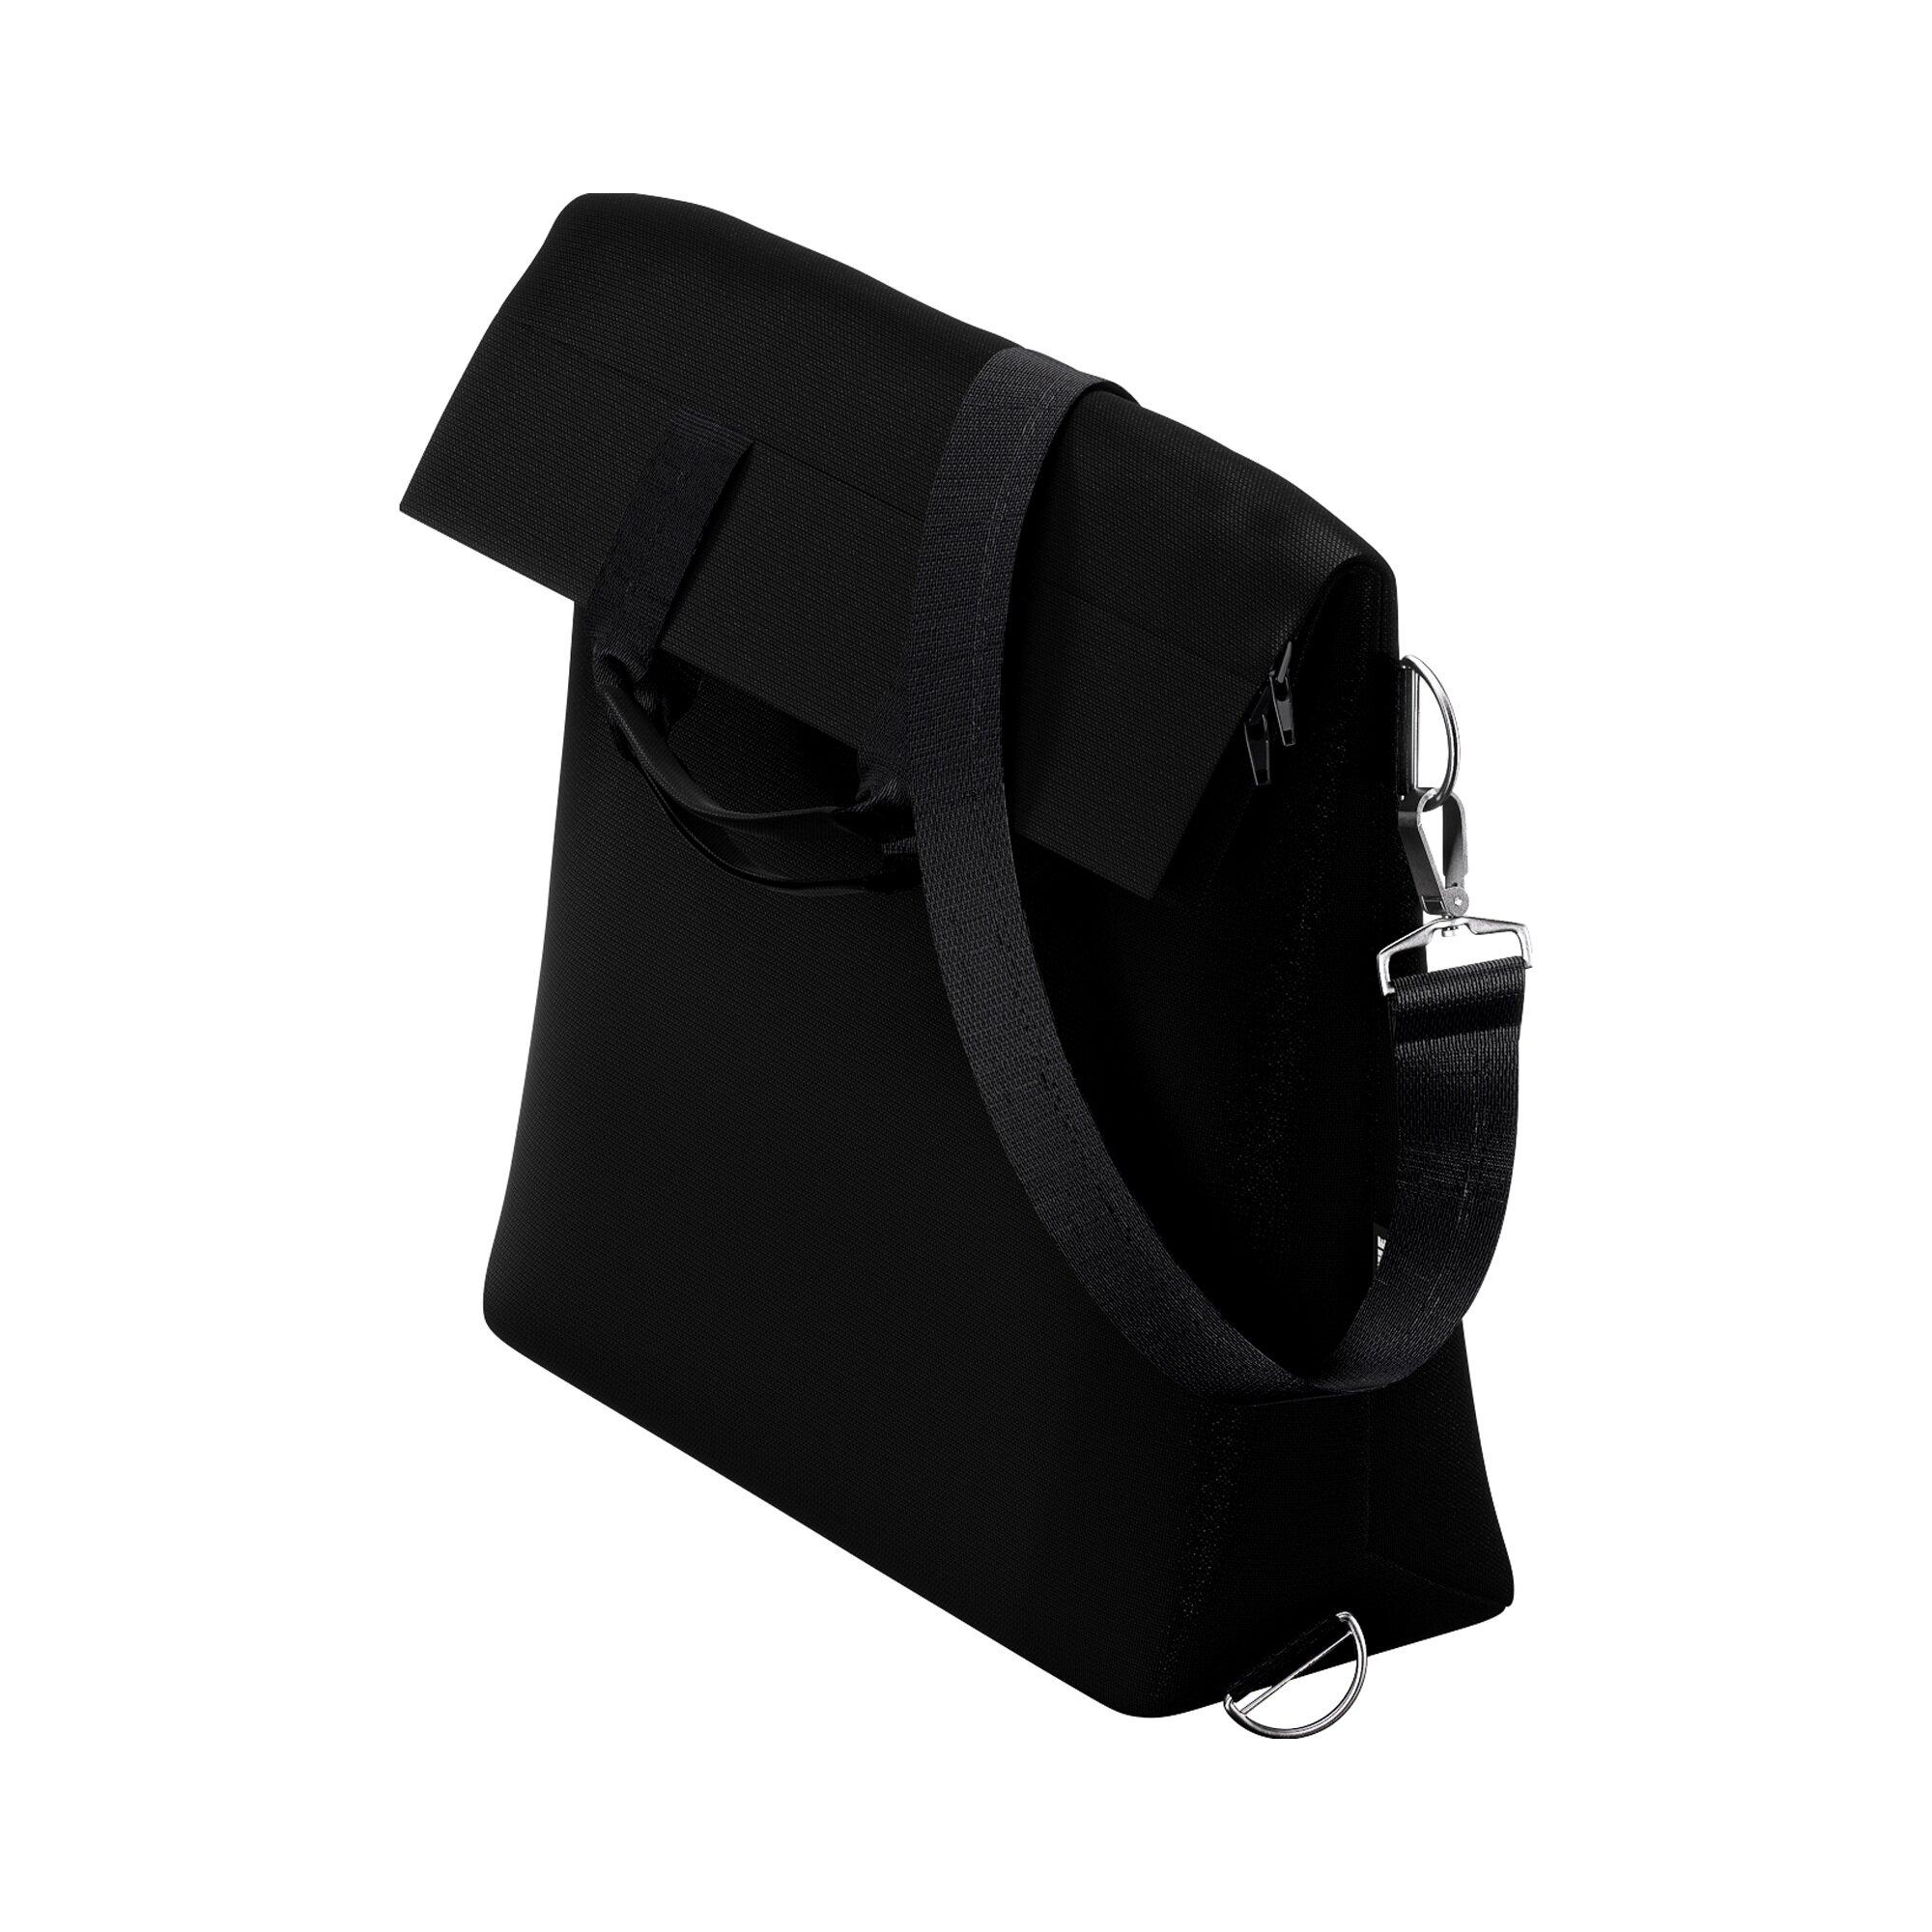 Thule Wickeltasche schwarz